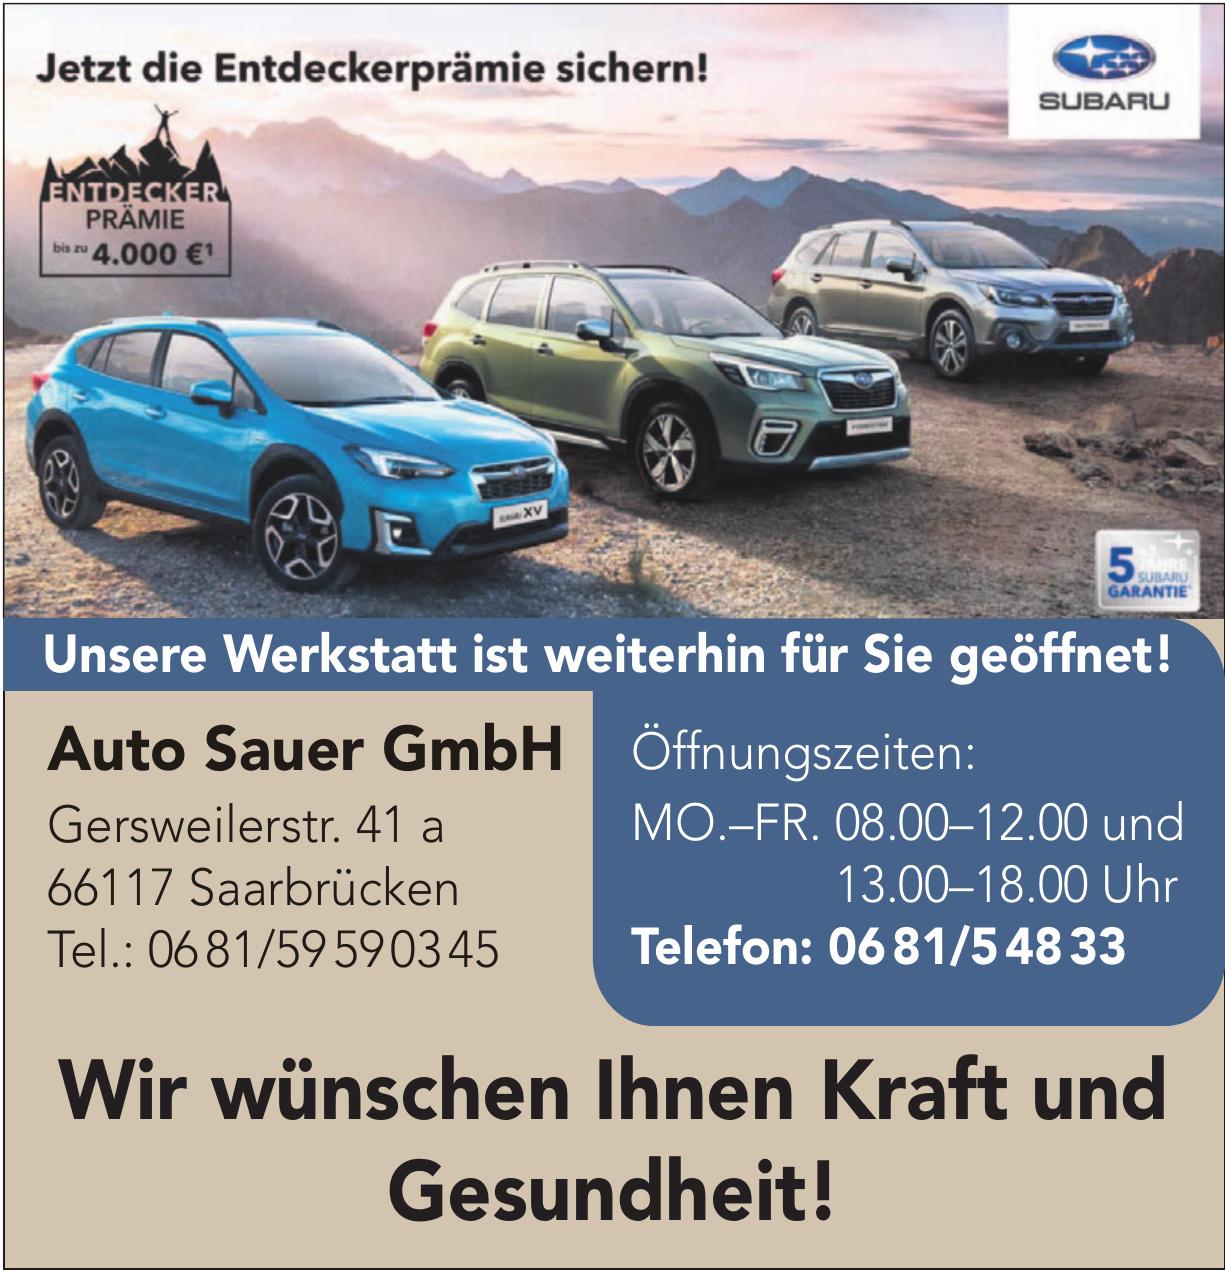 Auto Sauer GmbH